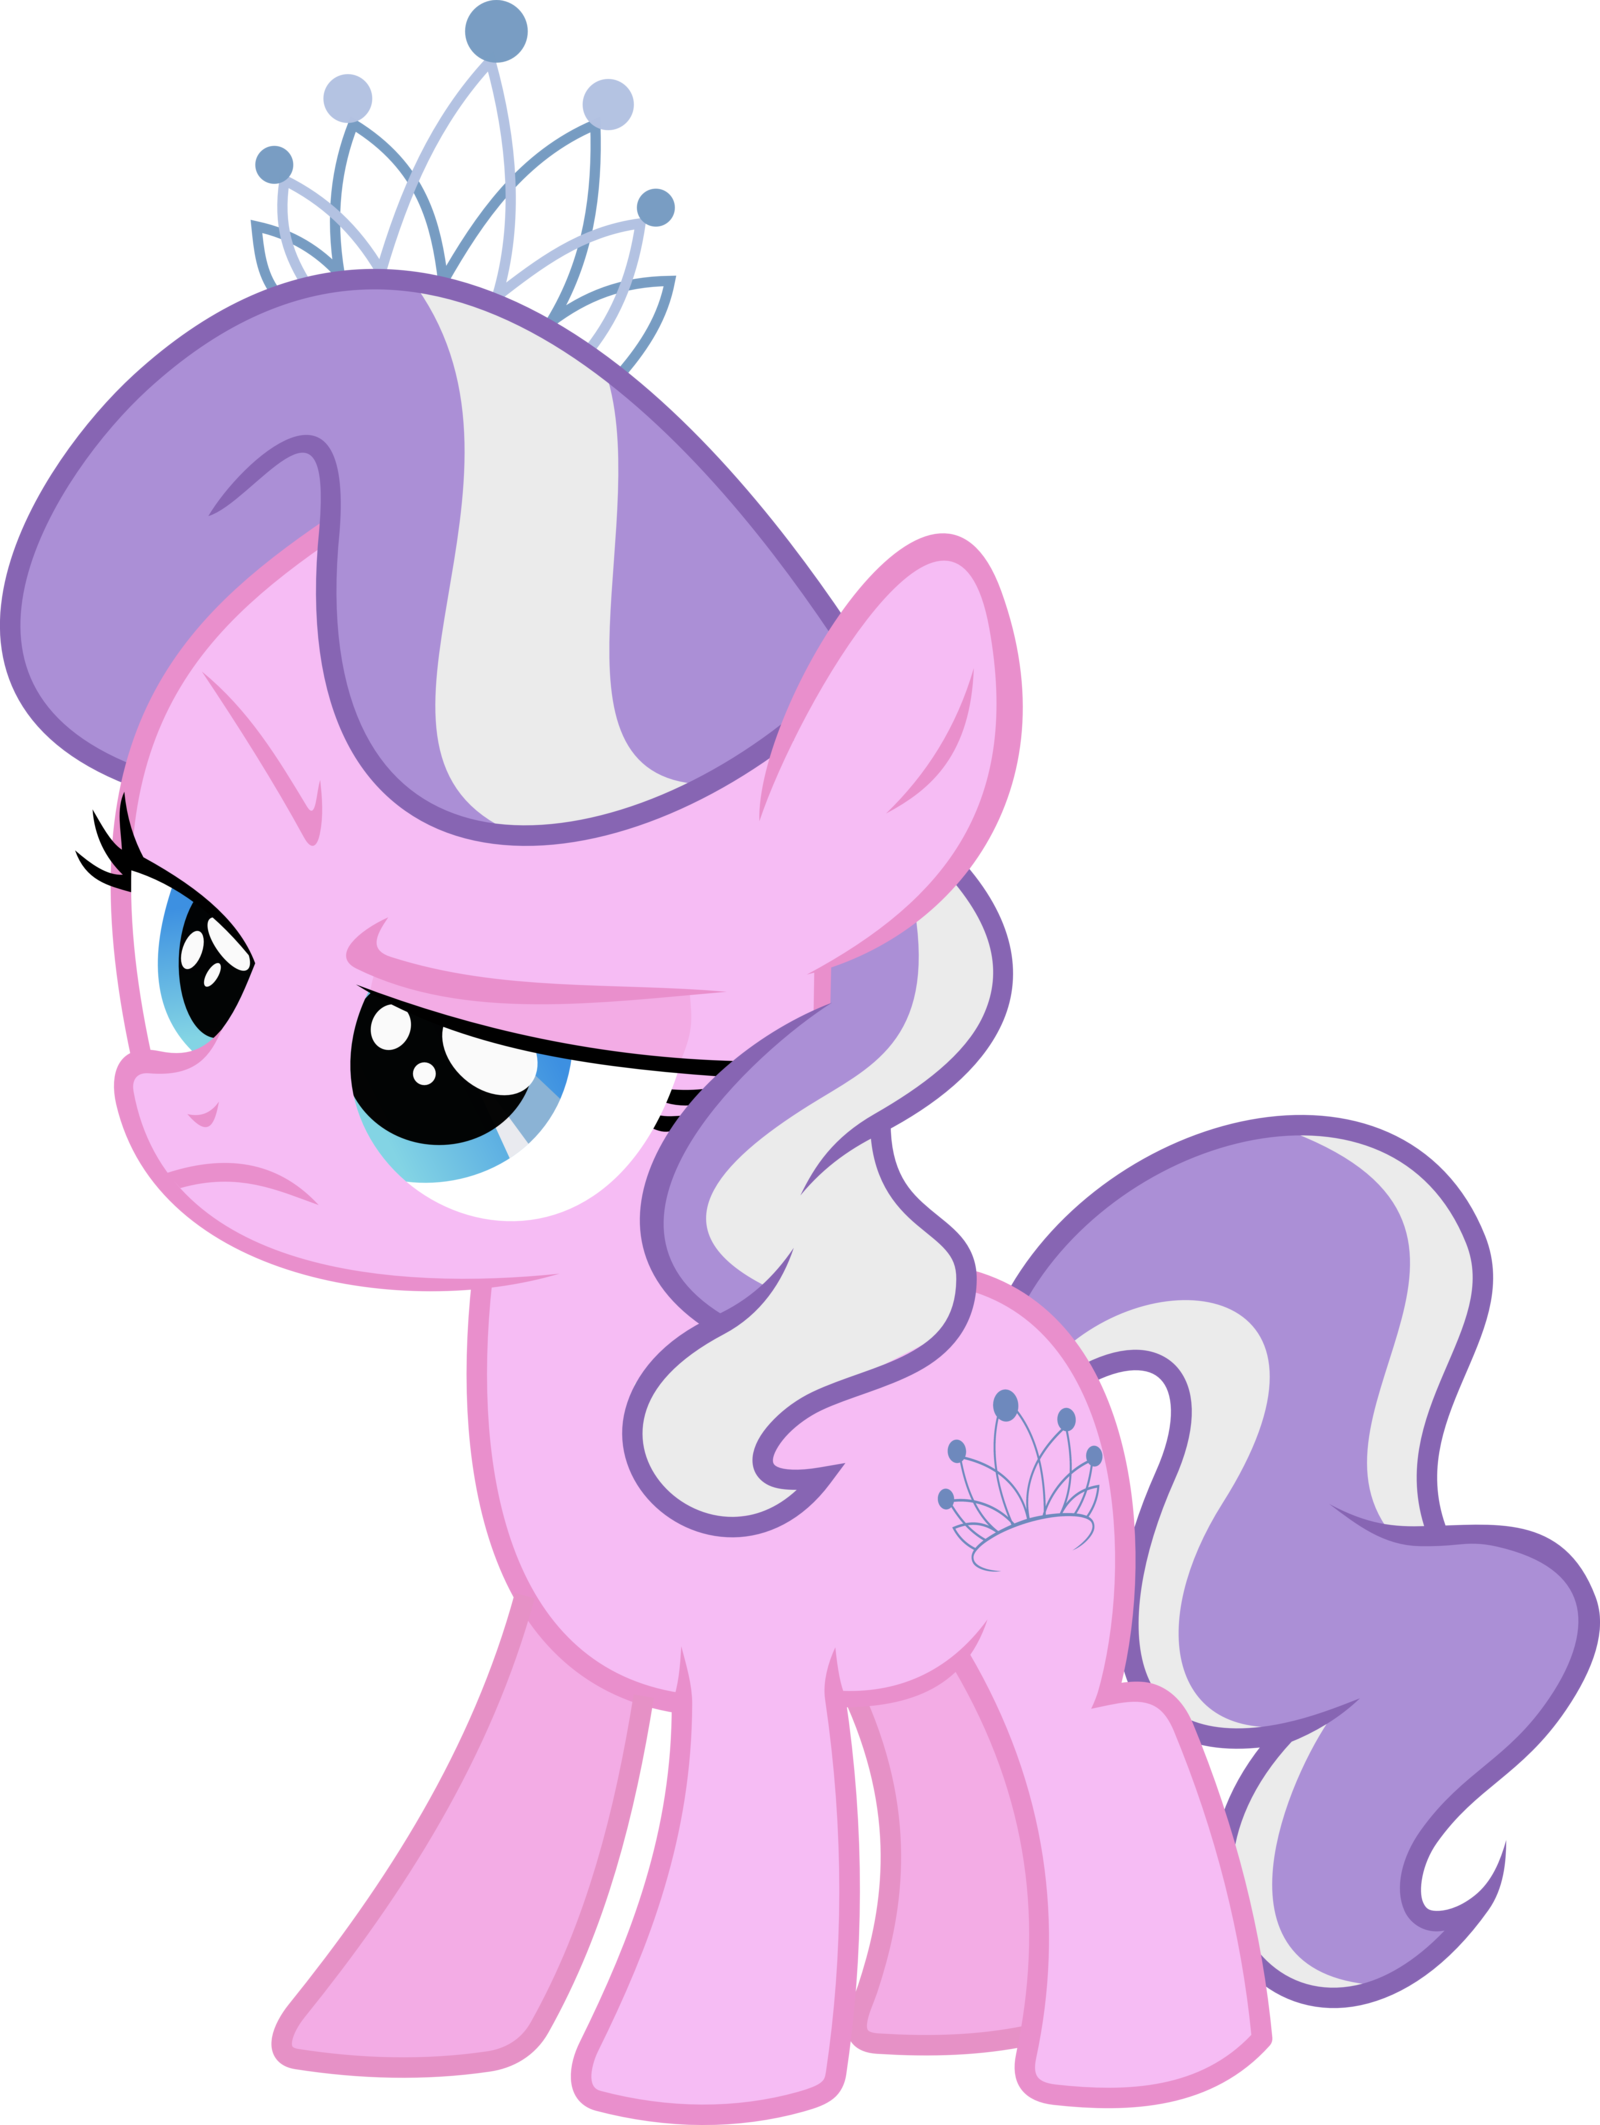 vector royalty free download Tiara is not pleased. Vector color diamond